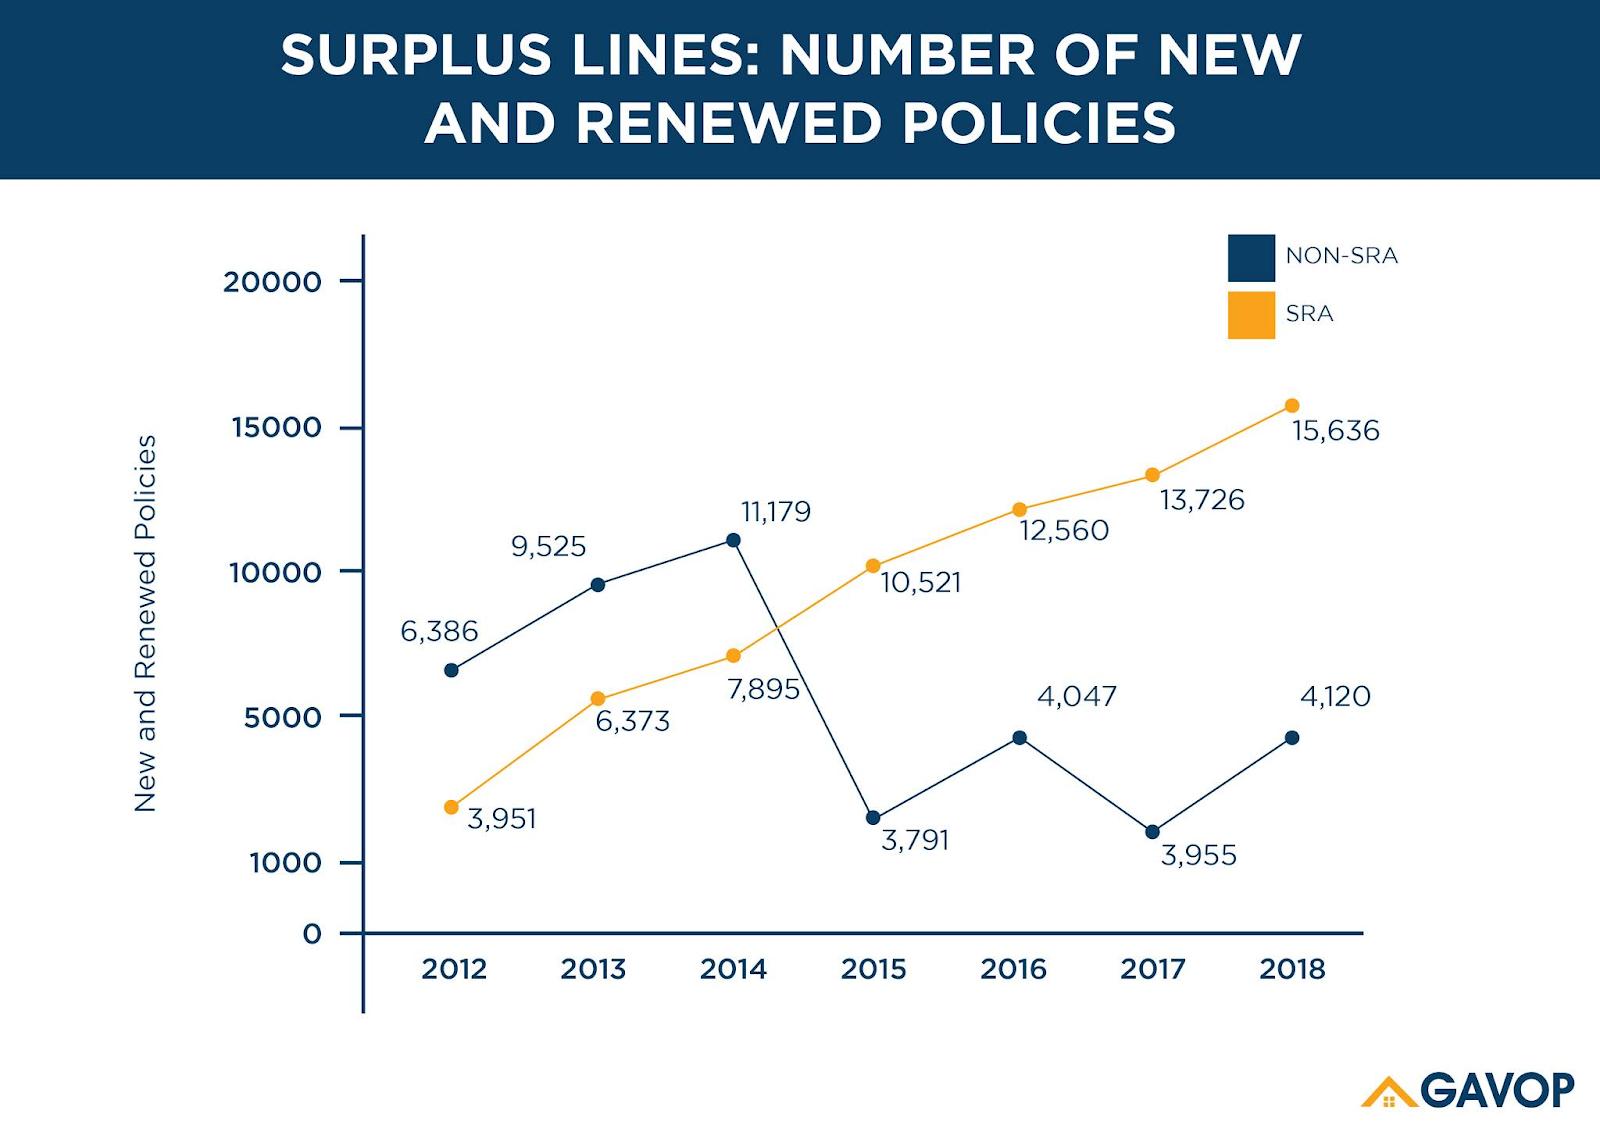 Surplus_lines